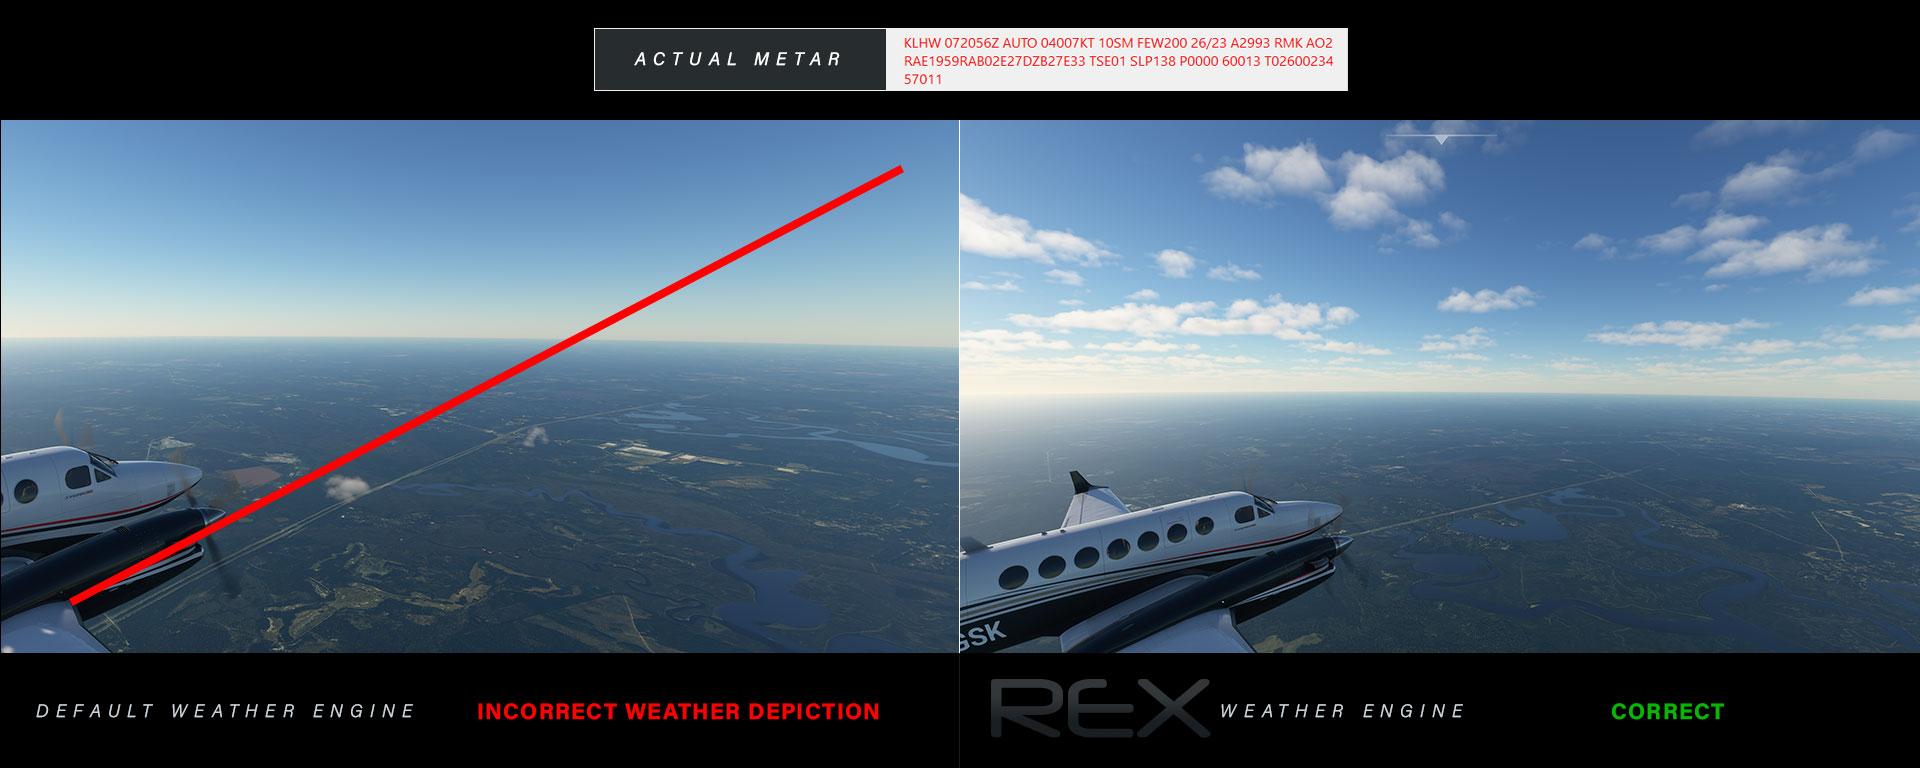 Sample of correct metar representation from REX